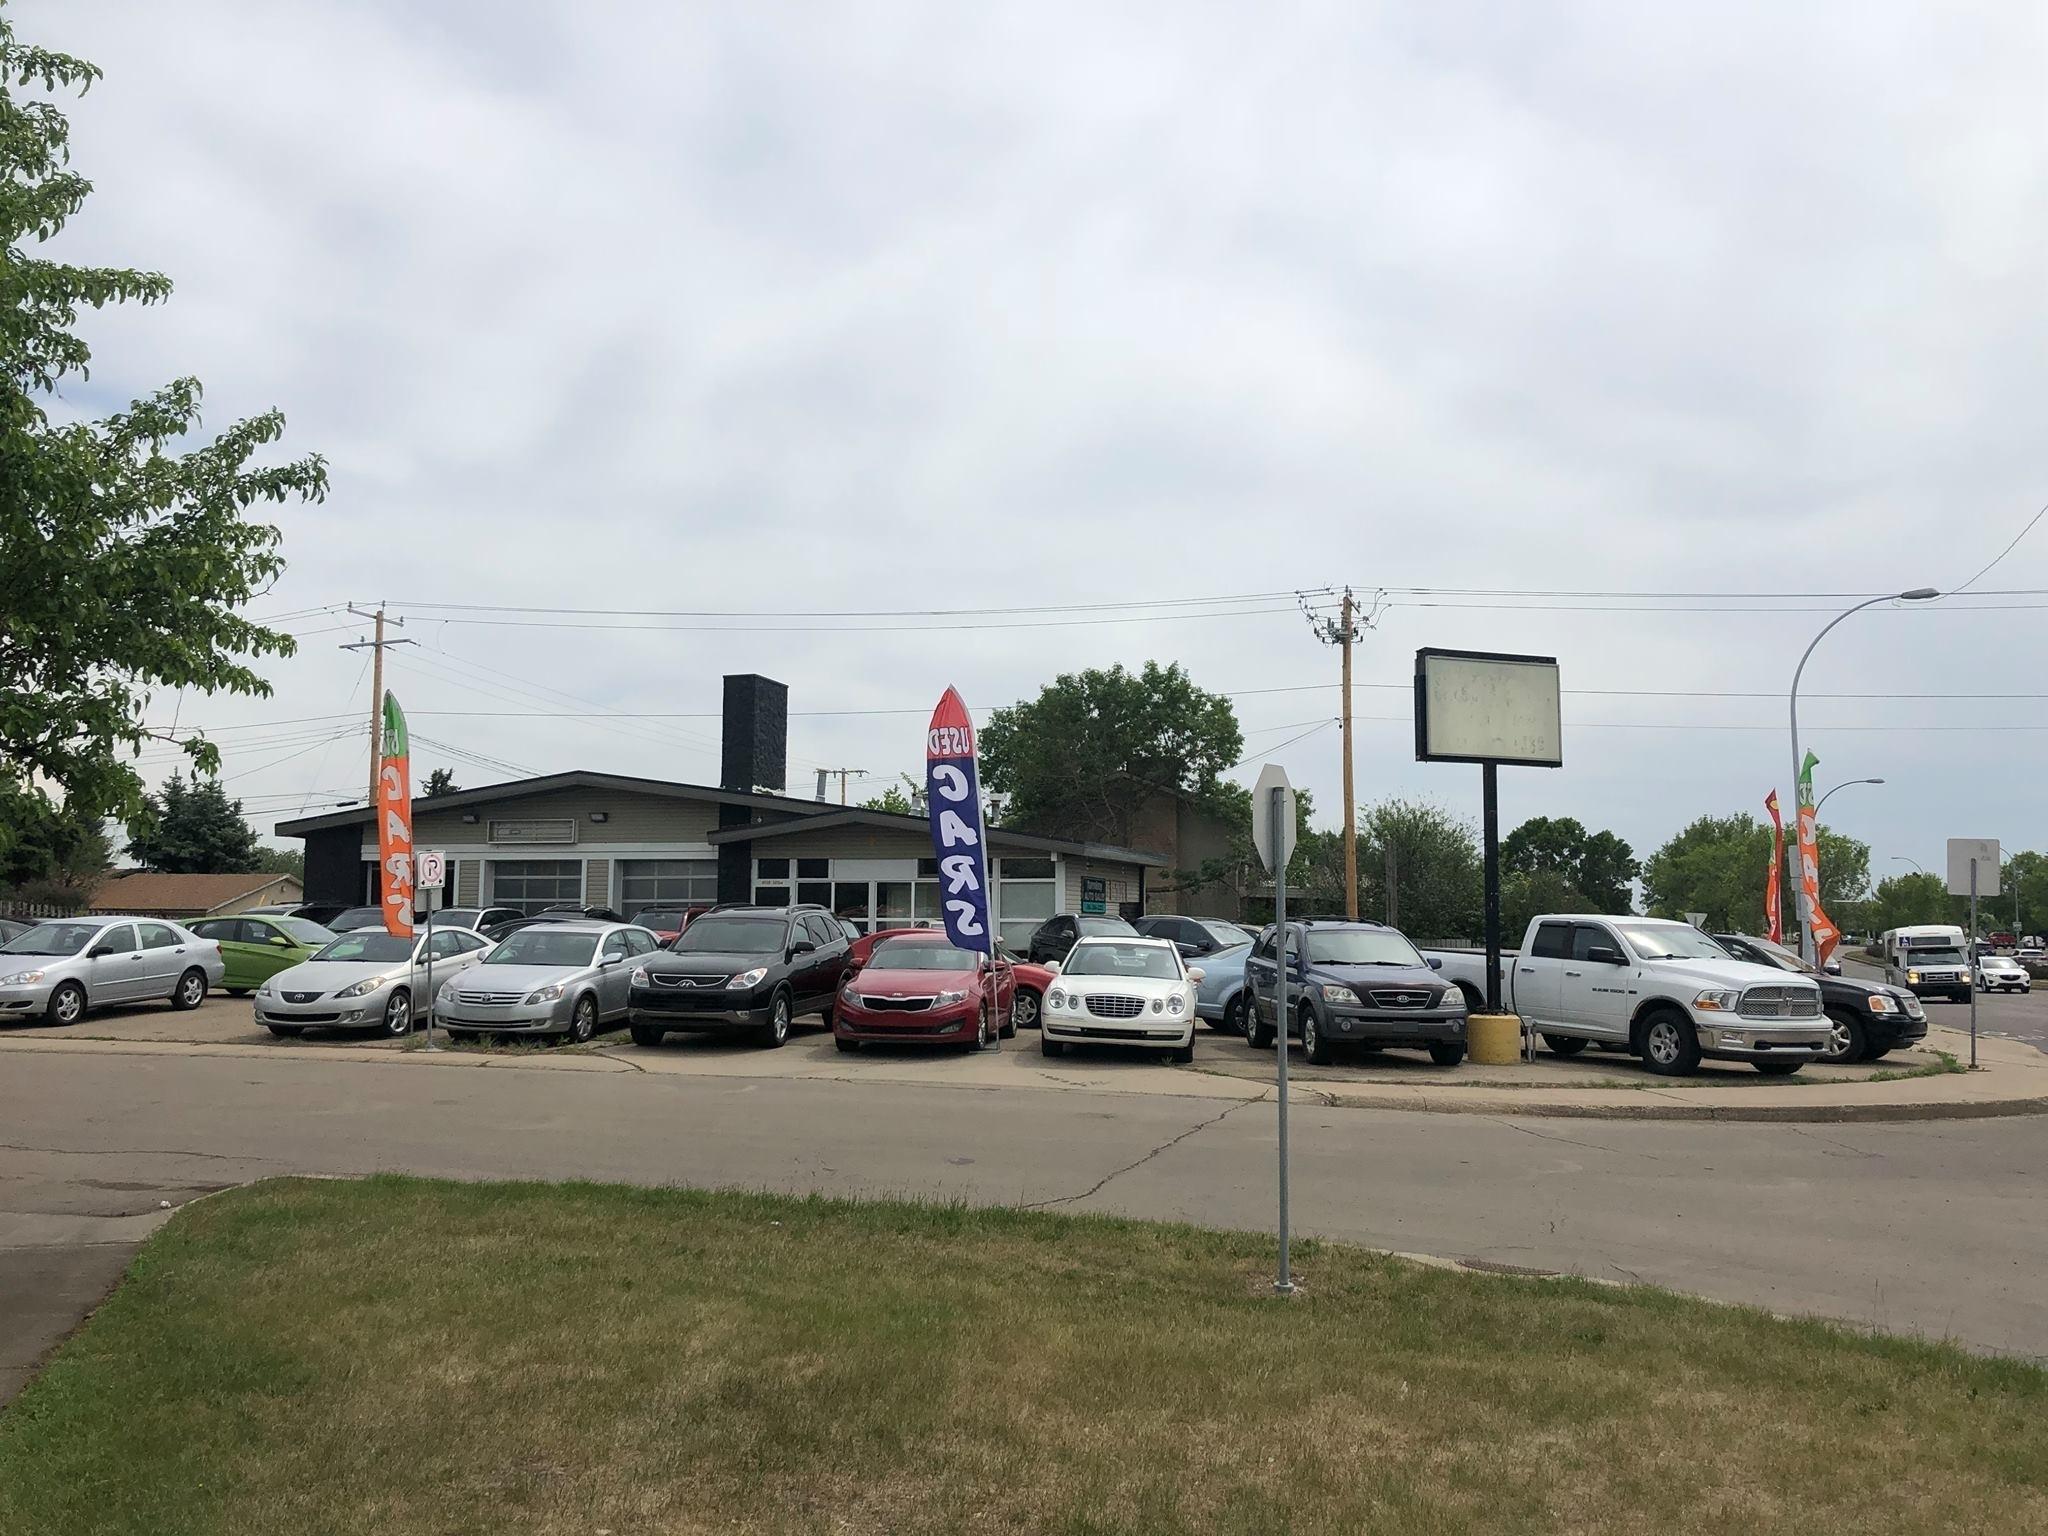 Turnkey Auto Sales Edmonton (780)244-3323